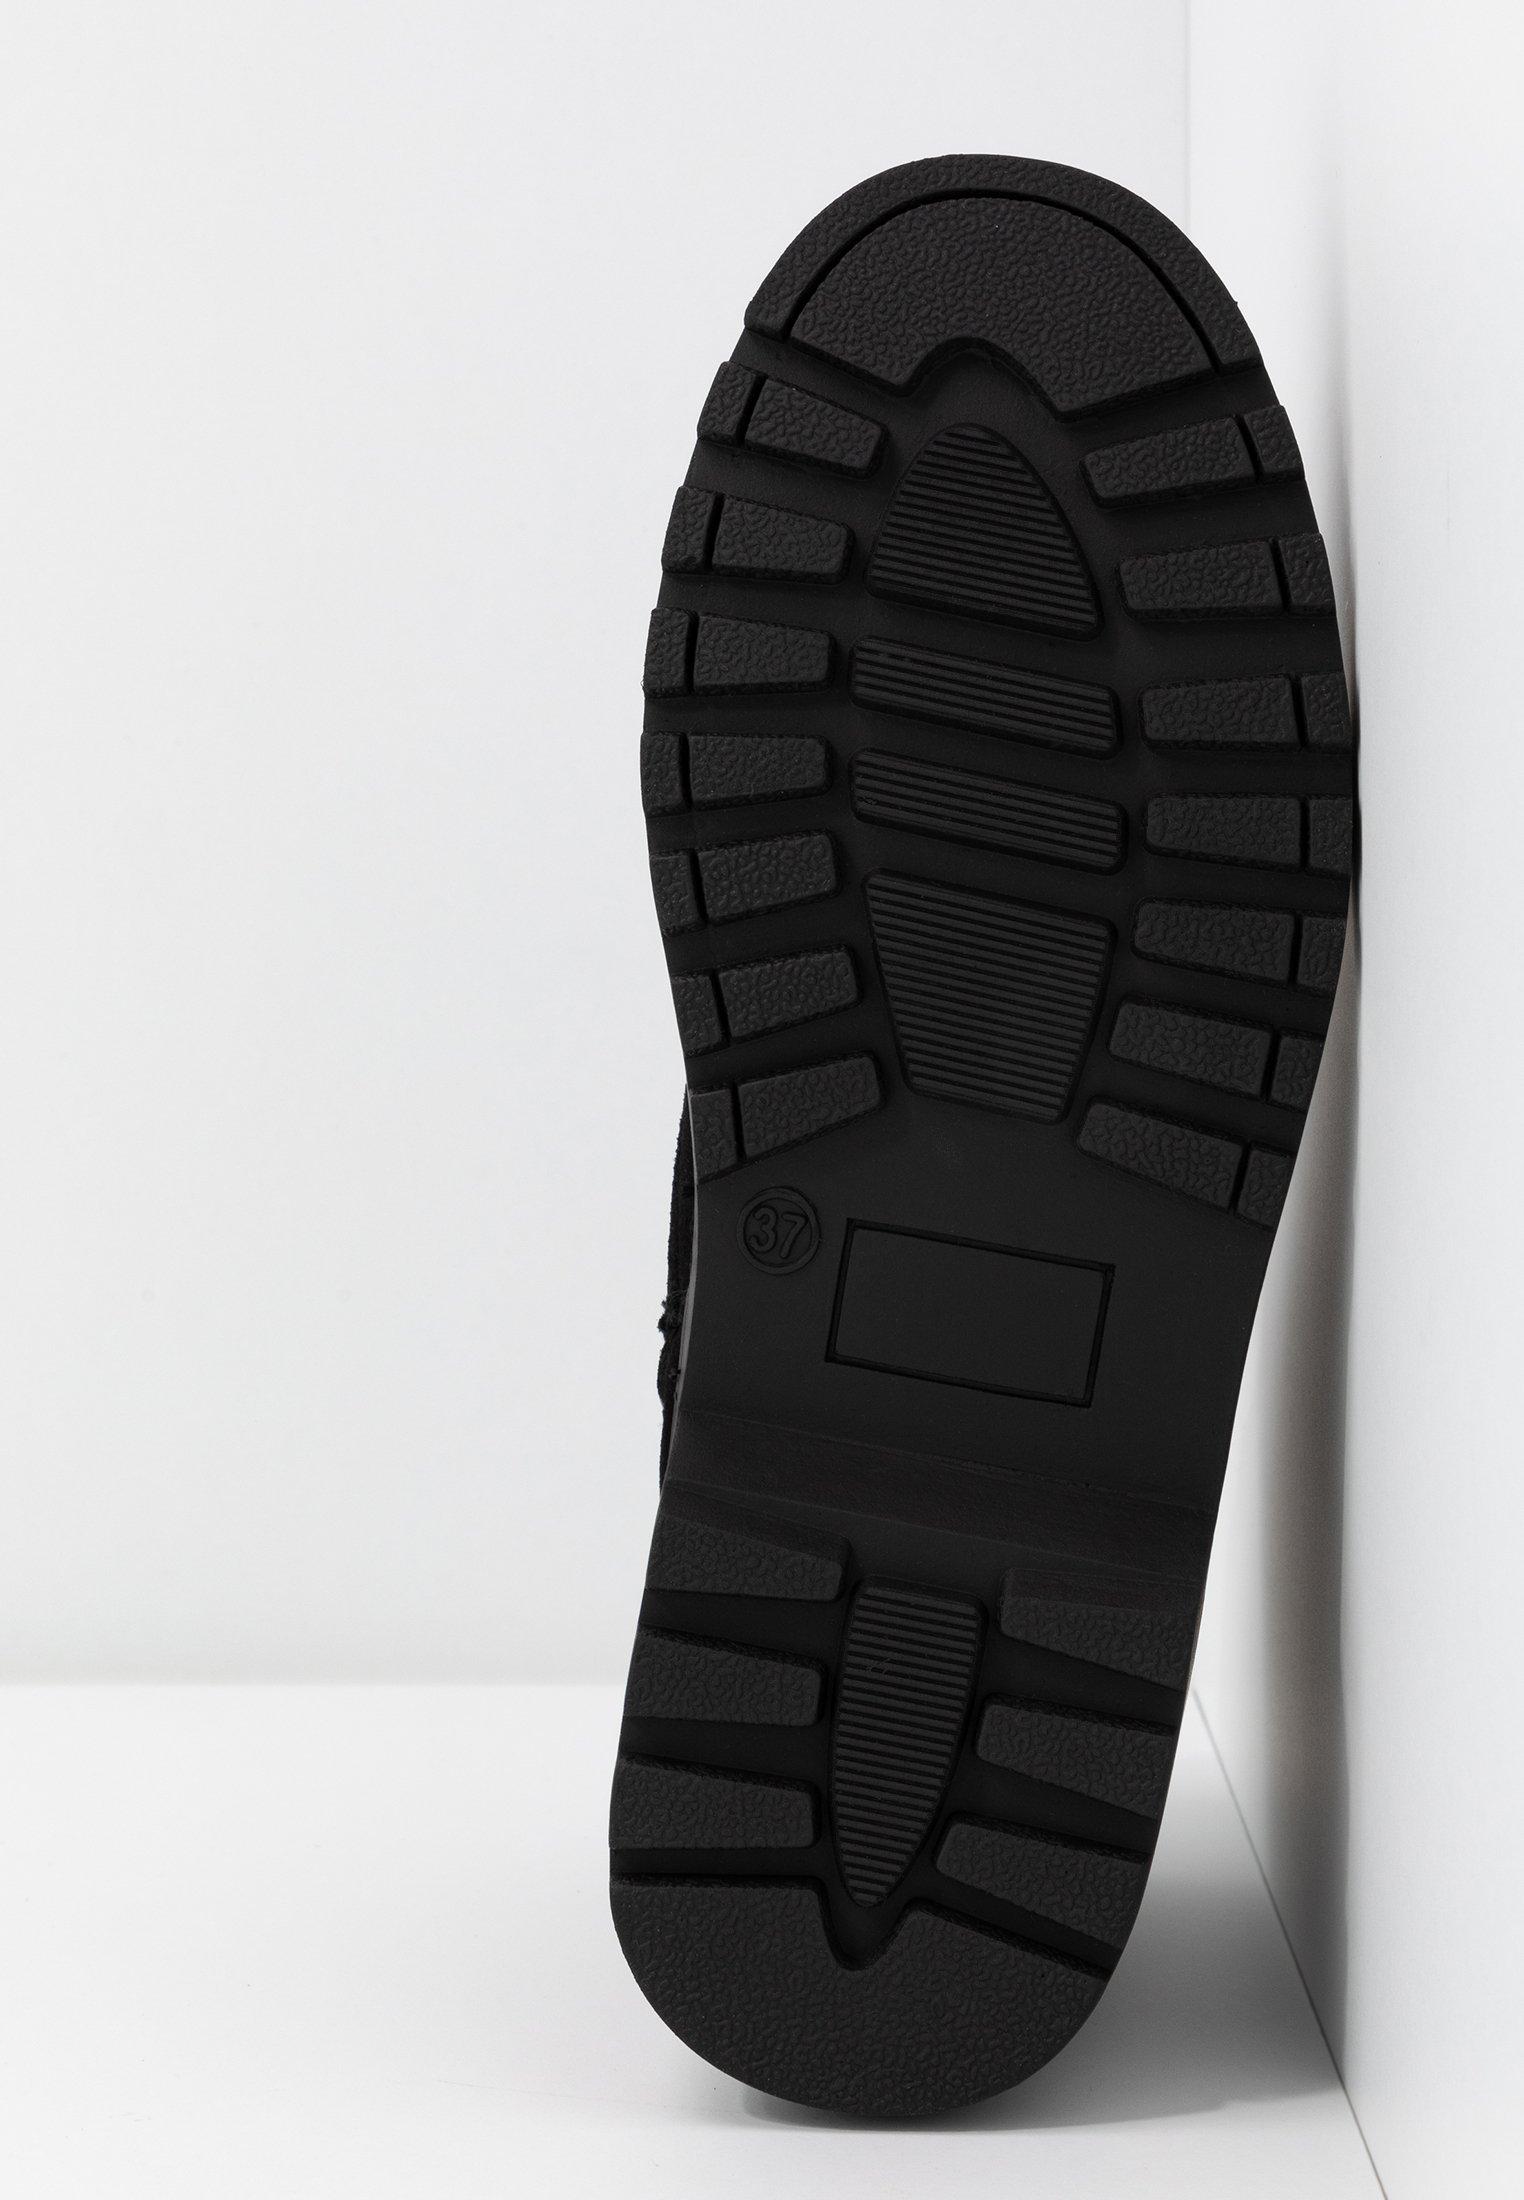 Topshop BUMBLE LACE UP BOOT Schnürstiefelette black/schwarz